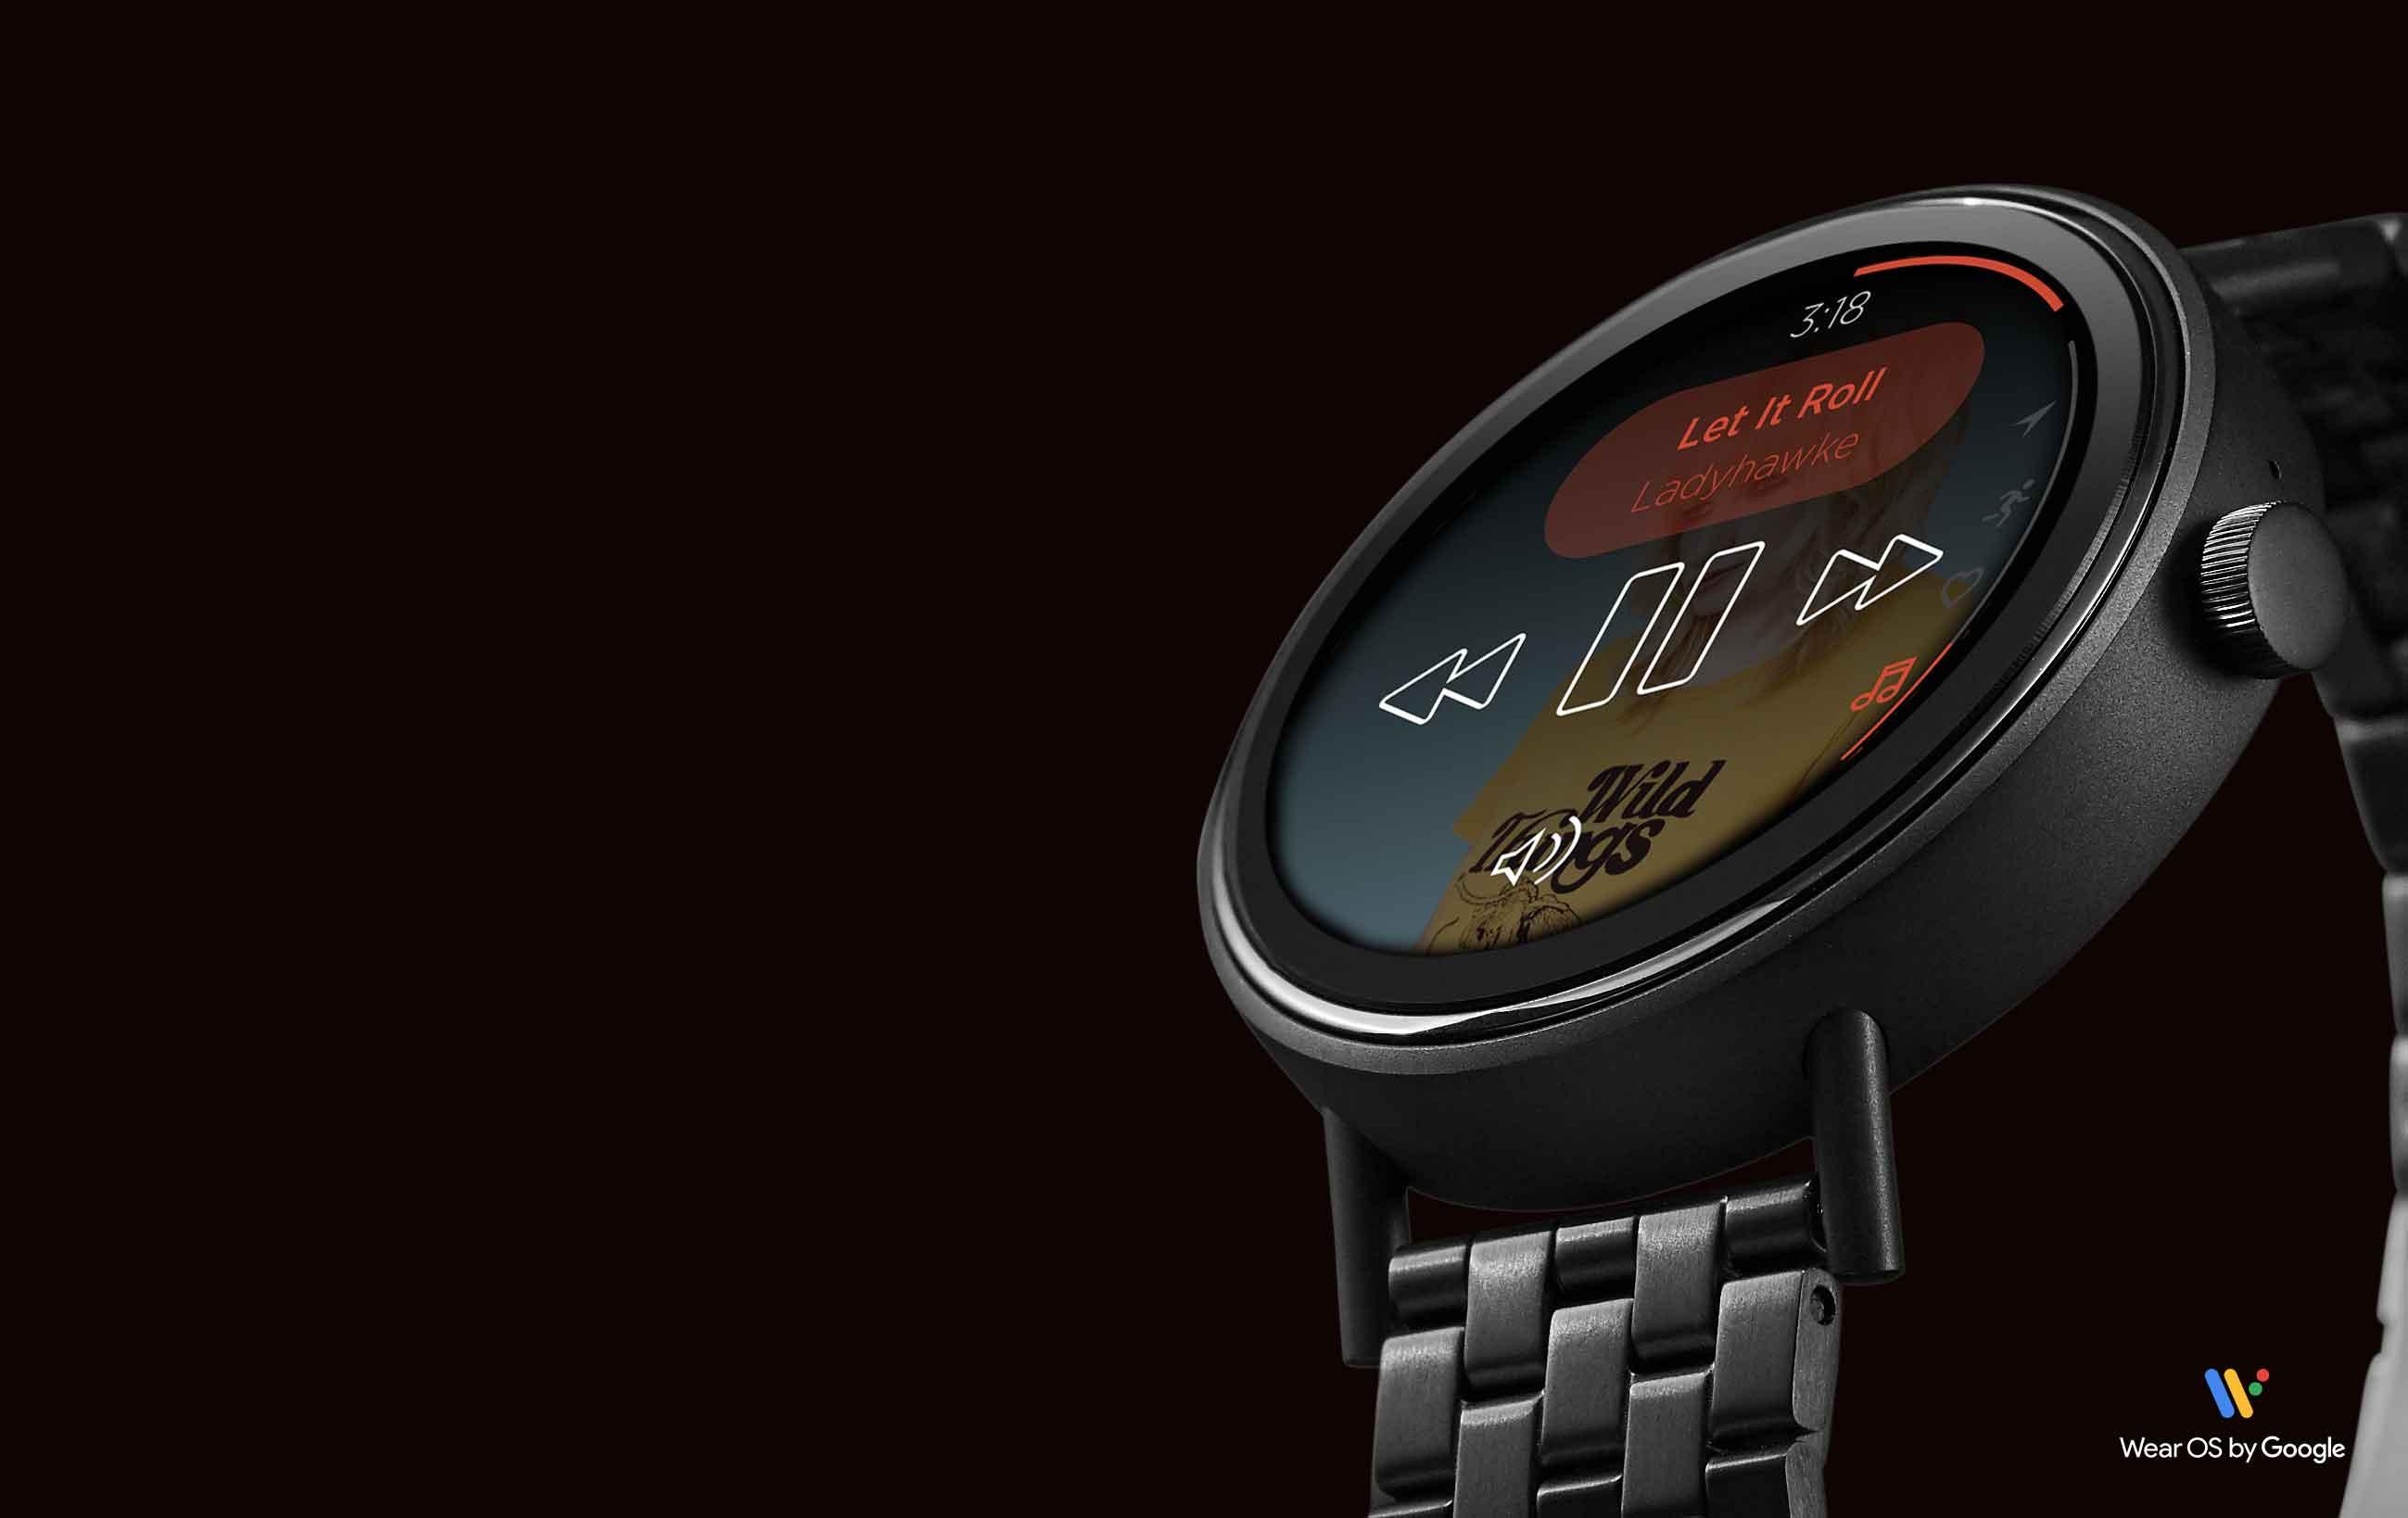 A misfit smartwatch